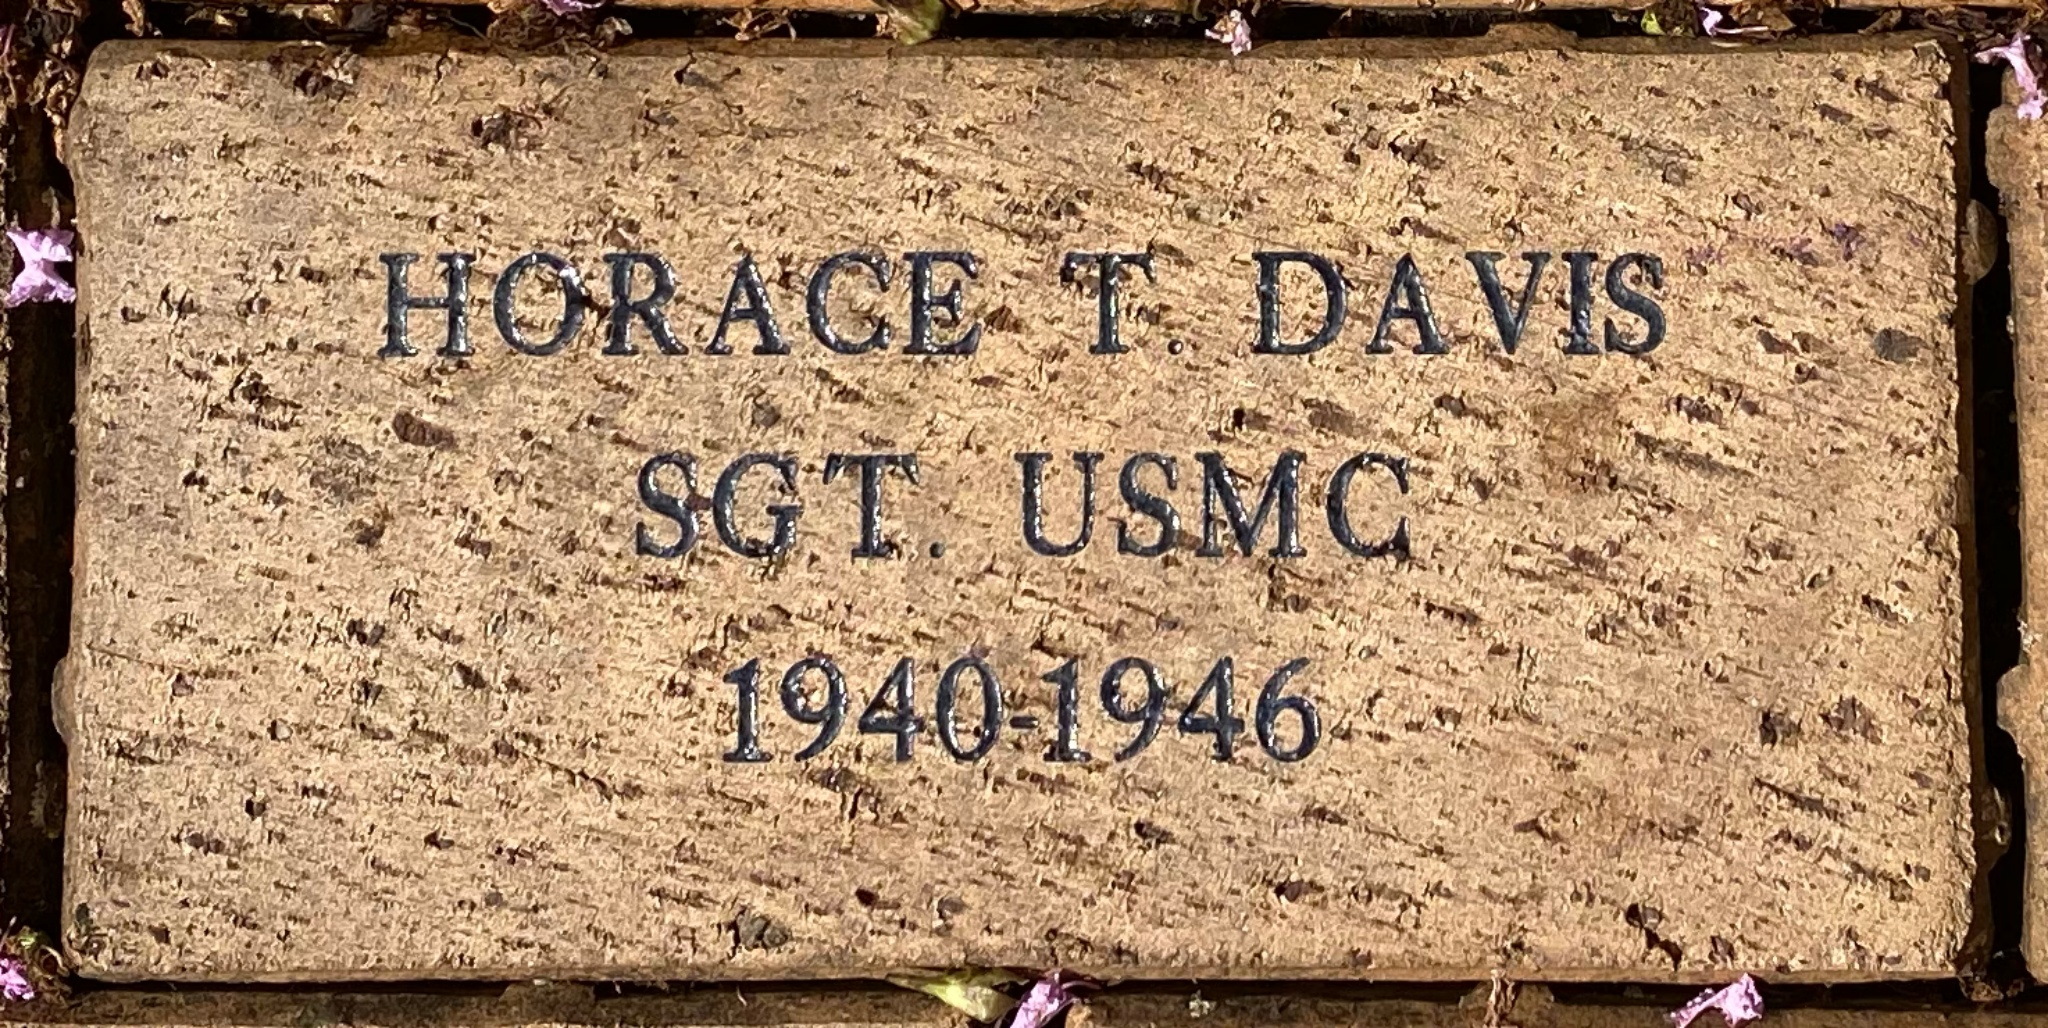 HORACE T. DAVIS SGT. USMC 1940-1946